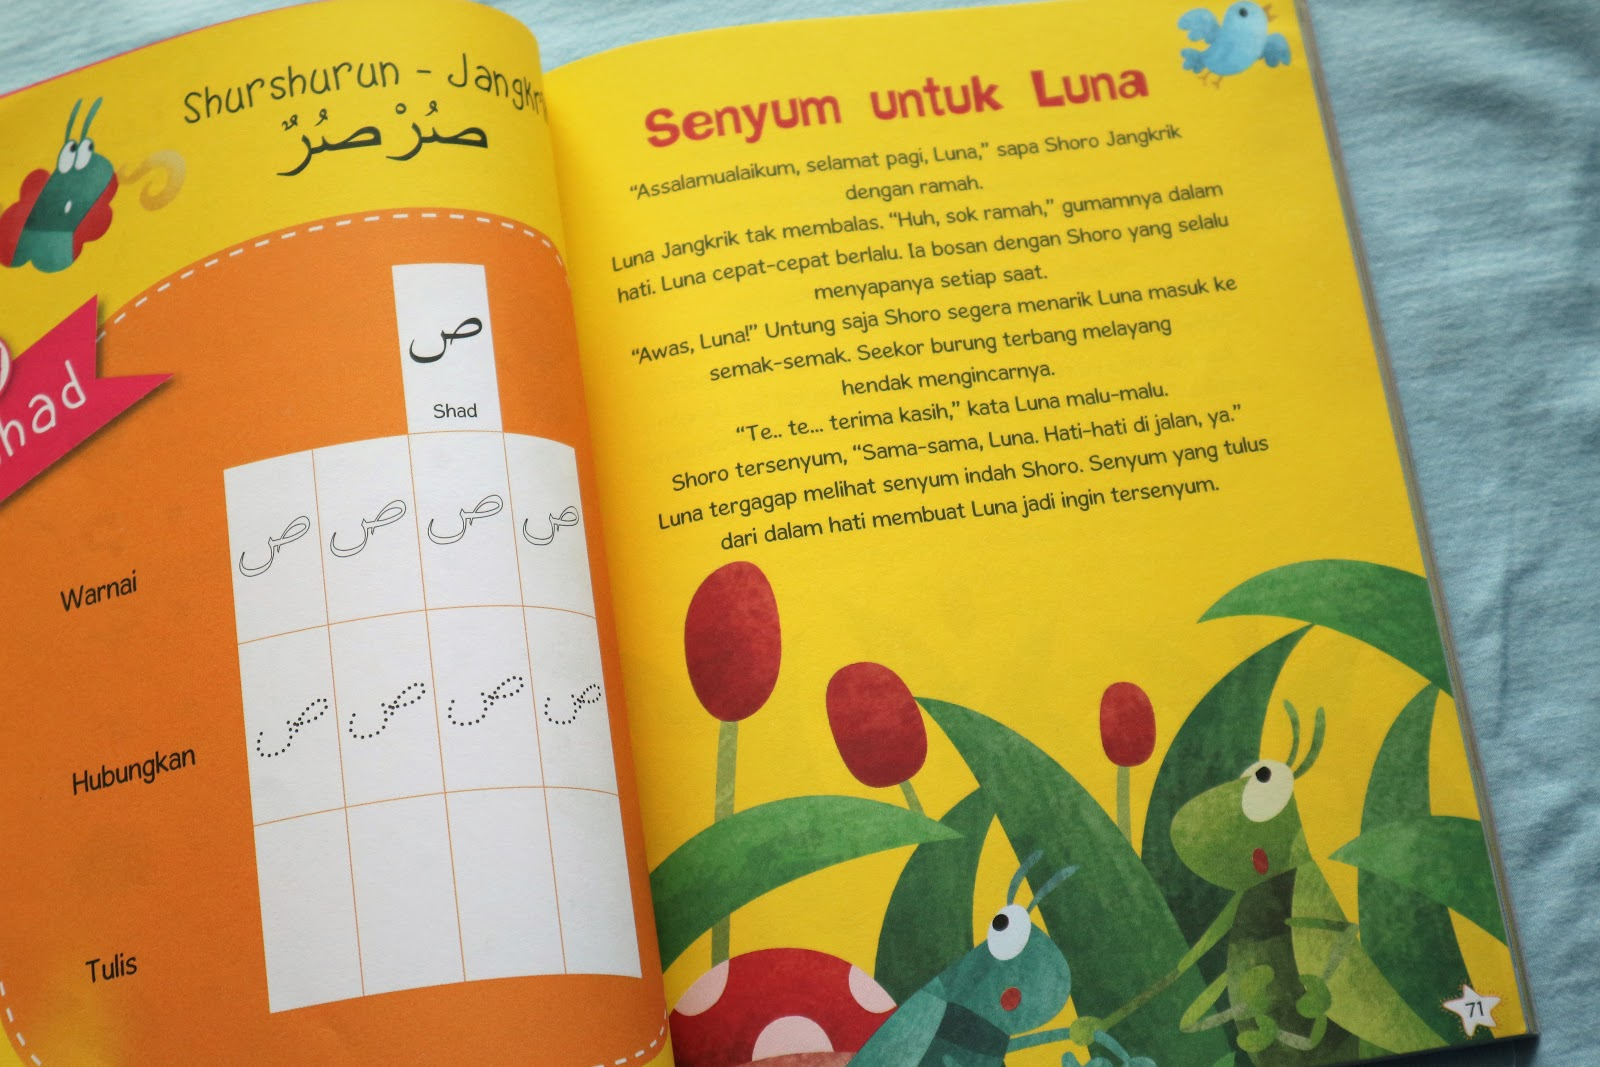 Ada pilihan untuk mewarnai huruf tracing lalu menuliskannya ulang Seru kan Jadi anak ikut terlibat aktif